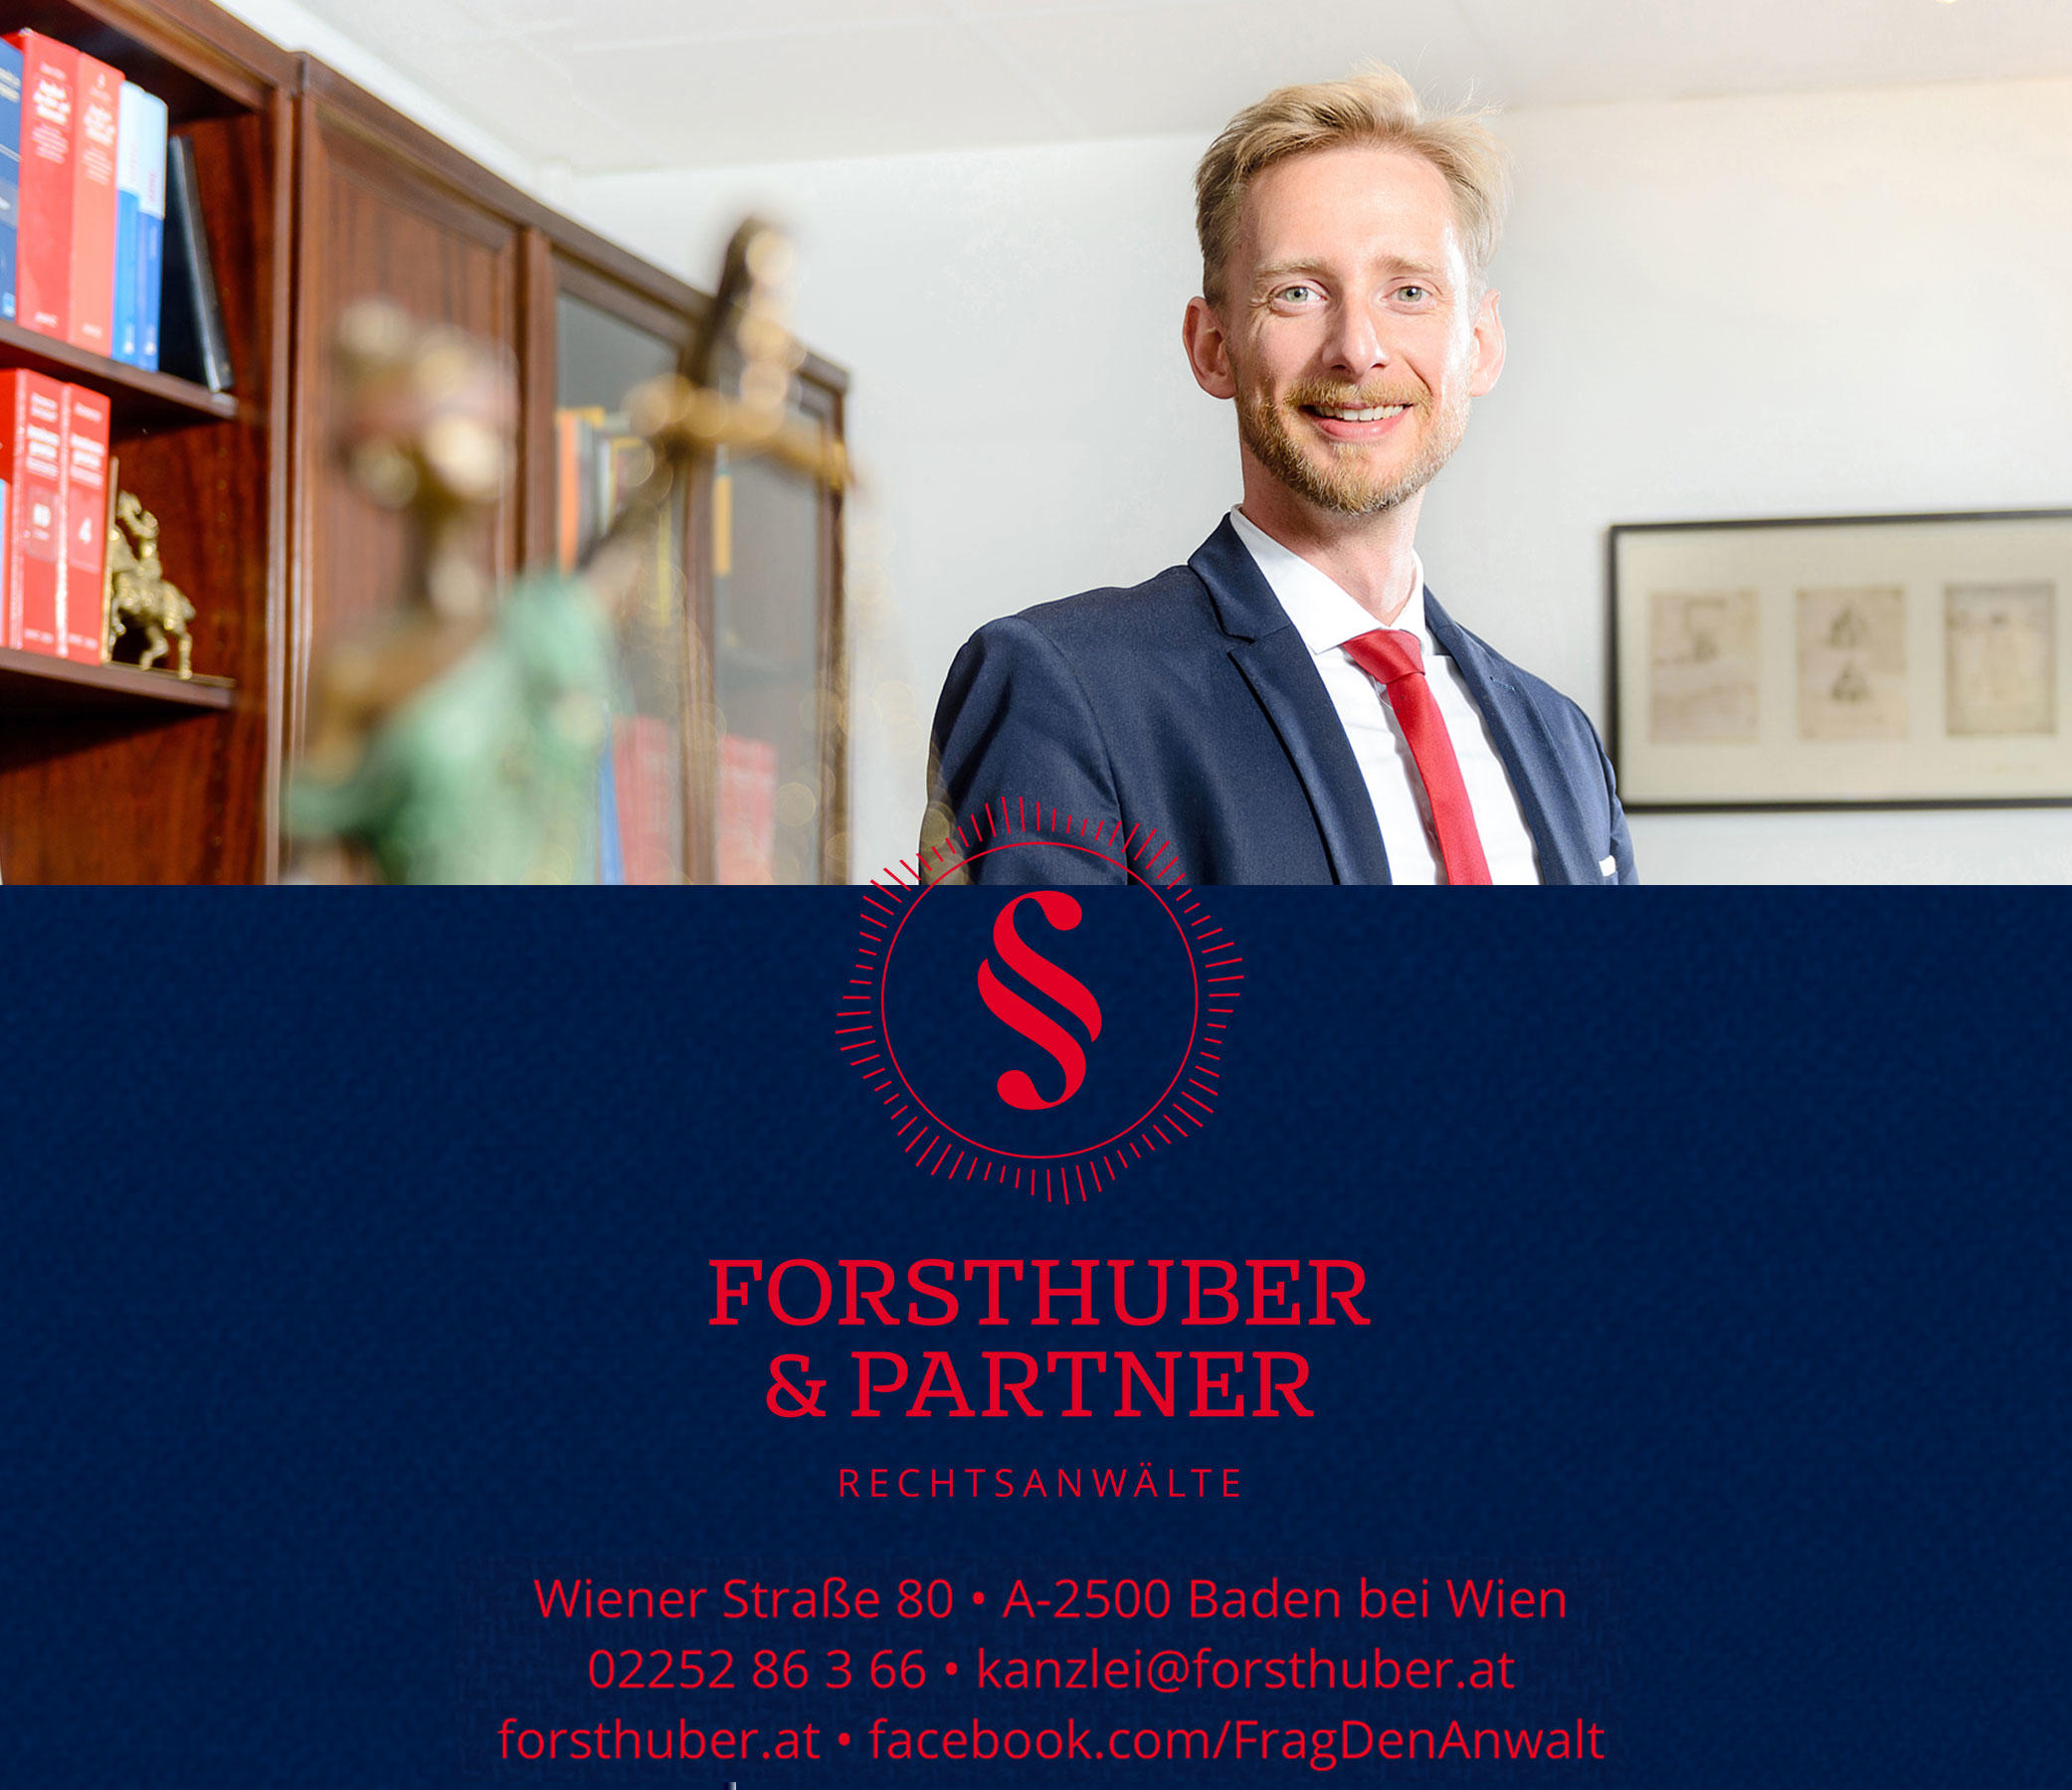 FORSTHUBER & PARTNER Rechtsanwälte